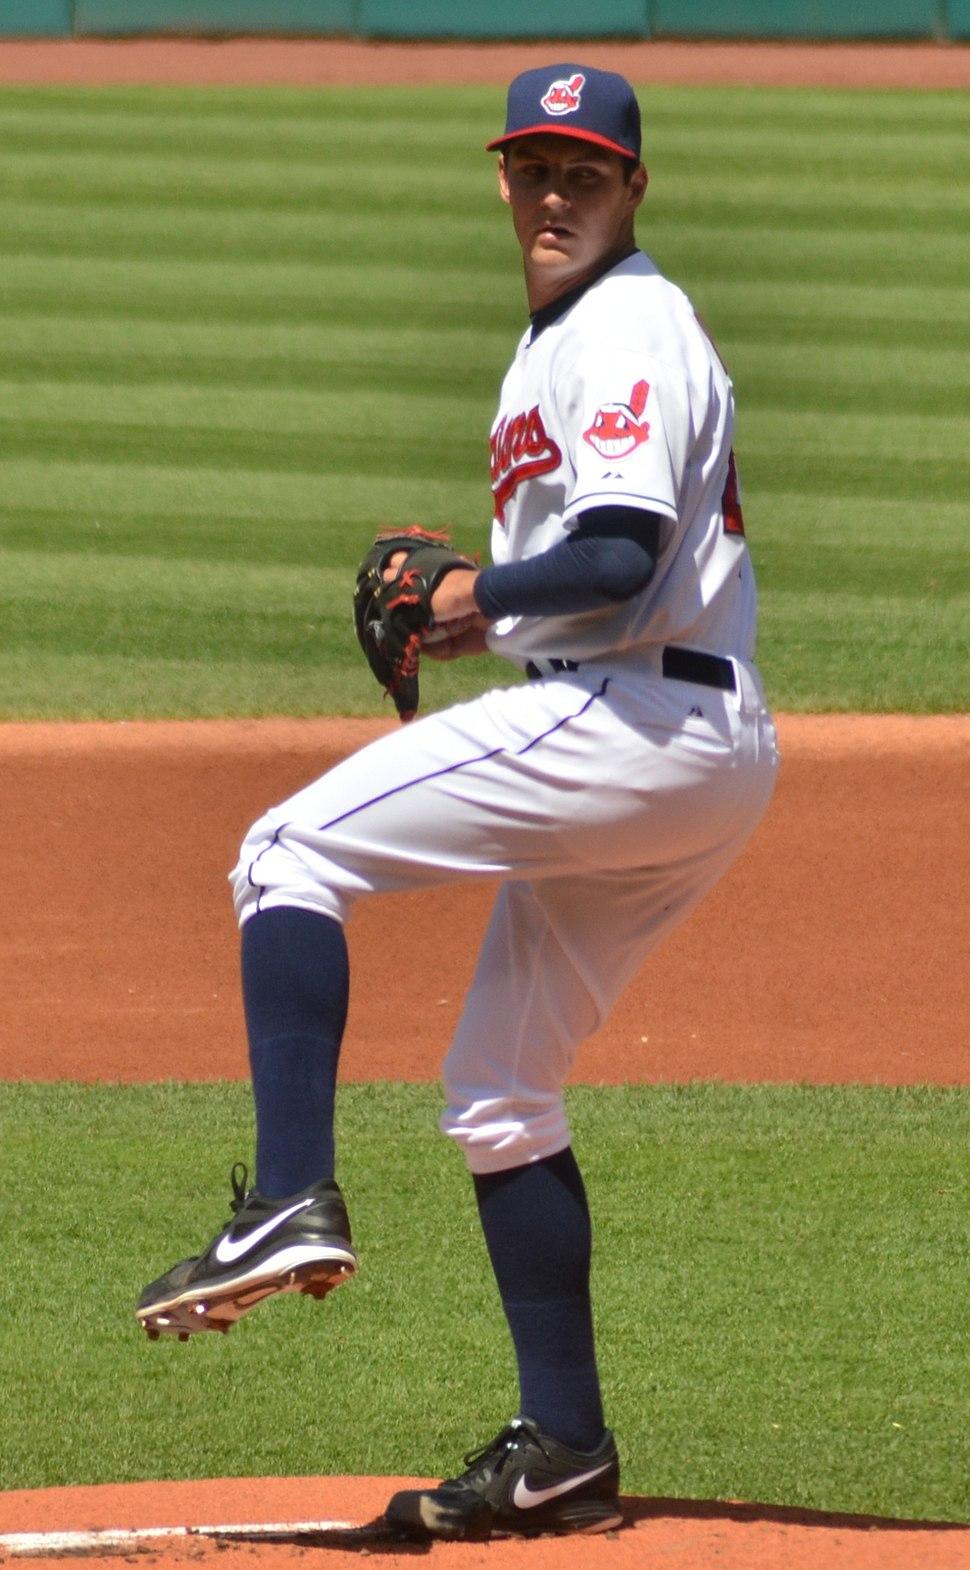 Trevor Bauer on May 13, 2013